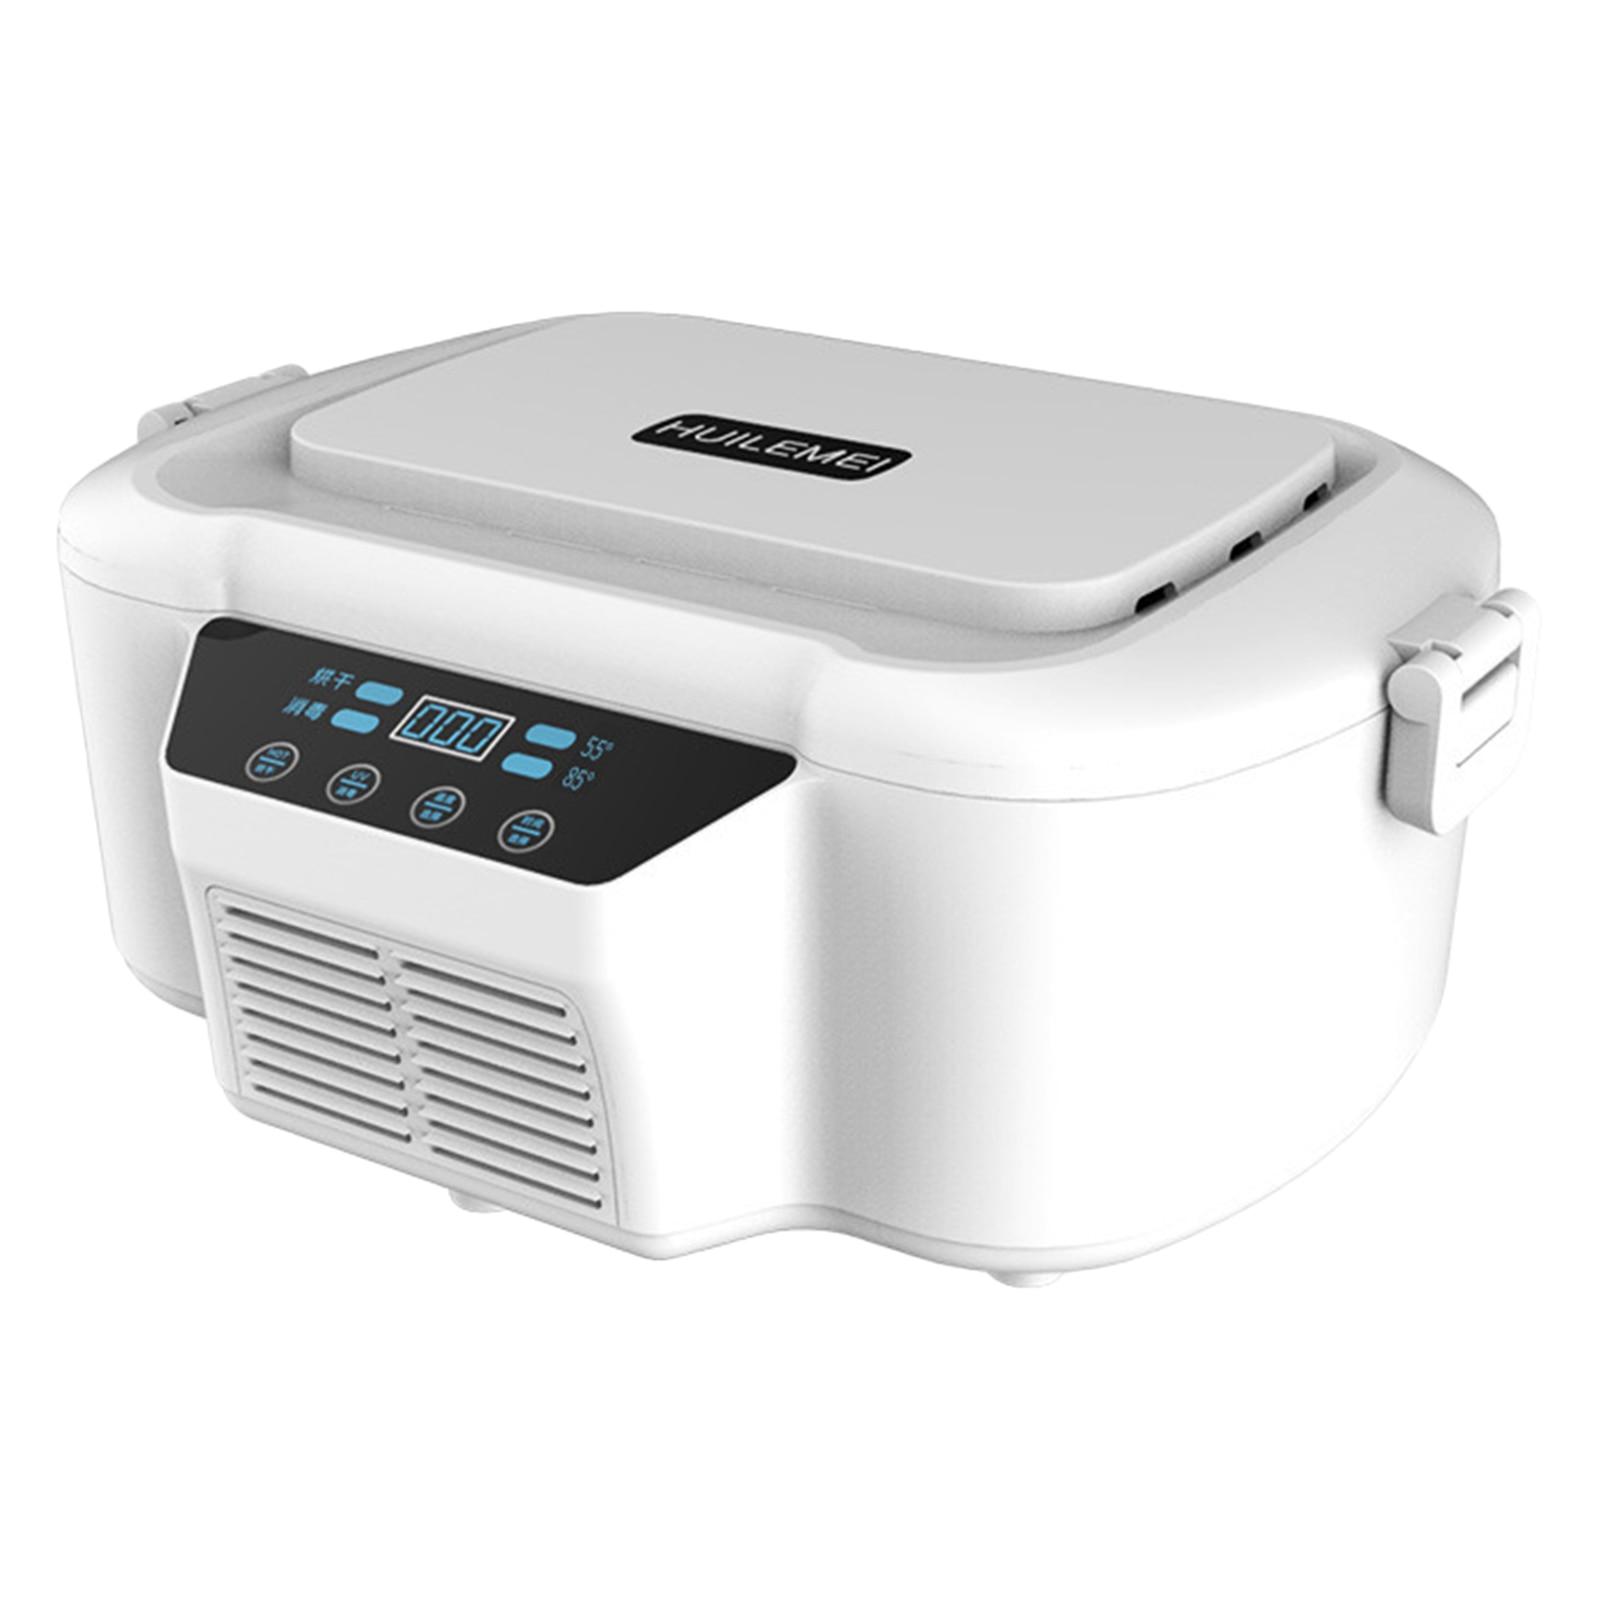 Sterilizer Box & Ozone Disinfection Ultraviolet Germicidal Lamp UV Sterilization Sanitizing for Baby Clothes,Underwear, Mask